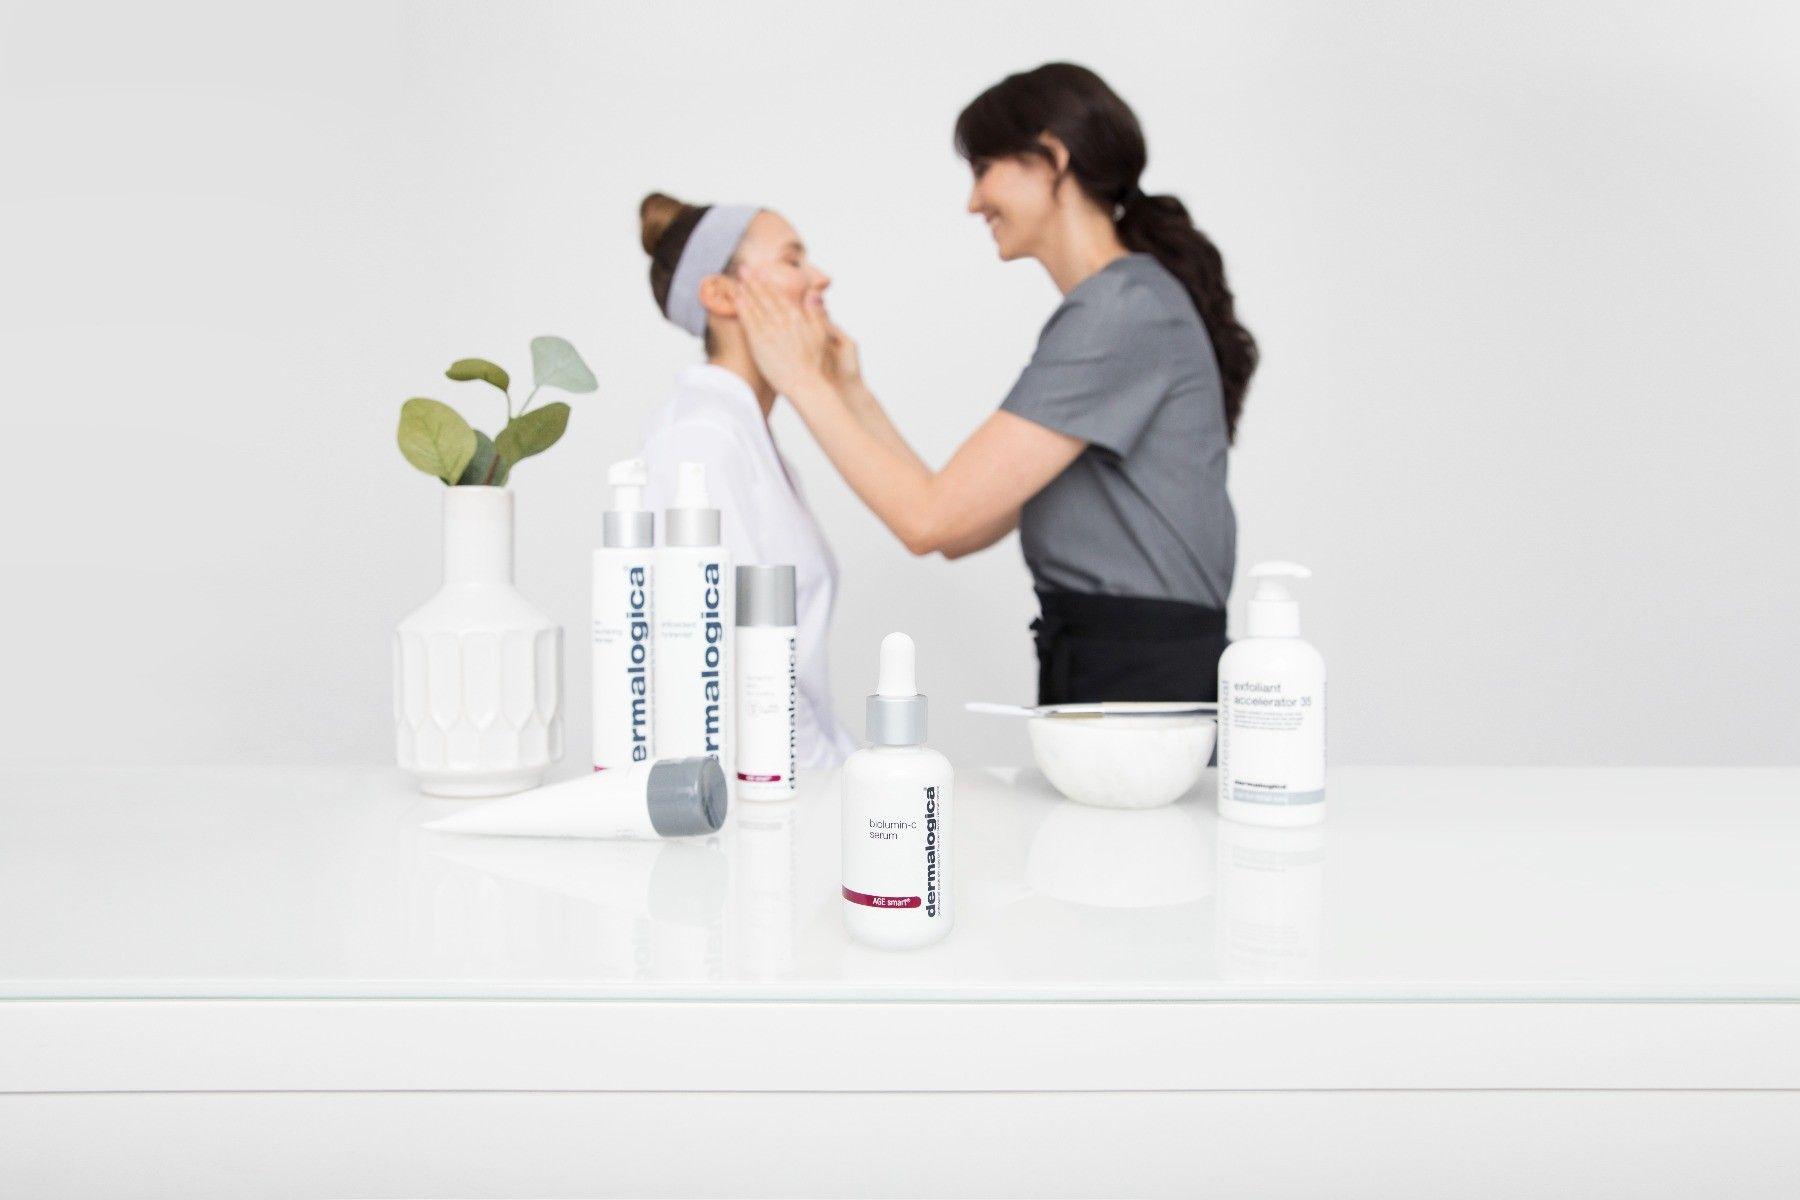 BioLumin-C Serum FaceFit